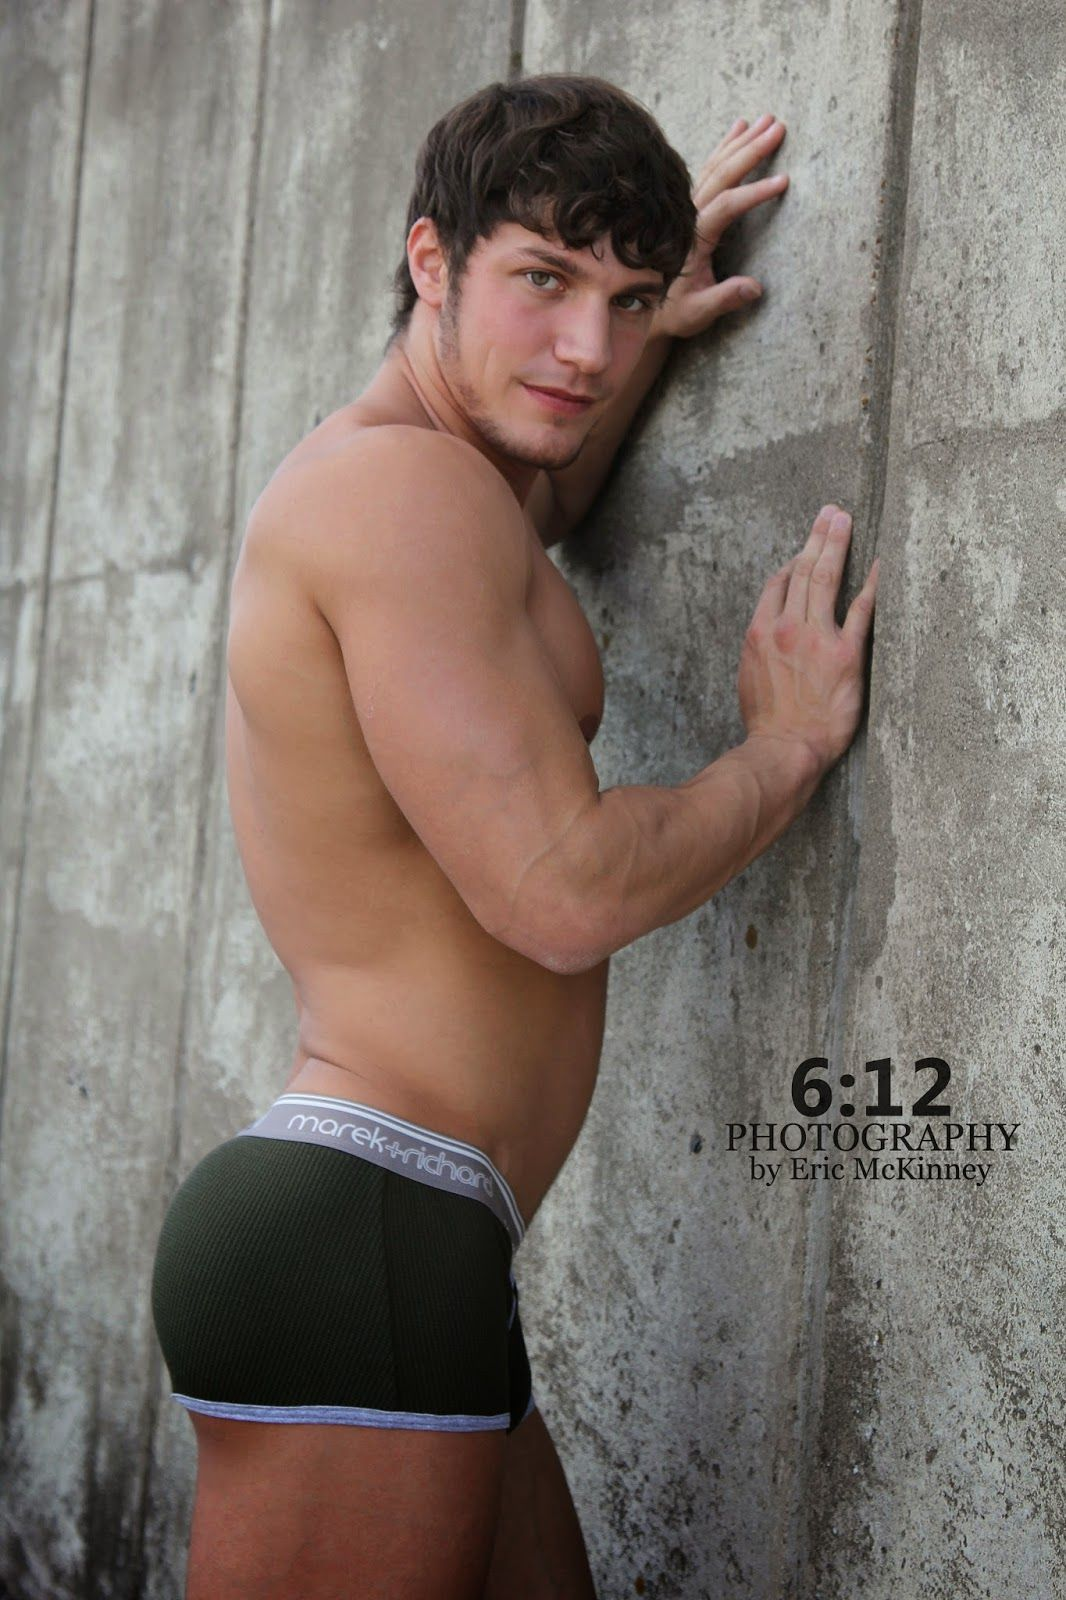 jeff brandon gay porno